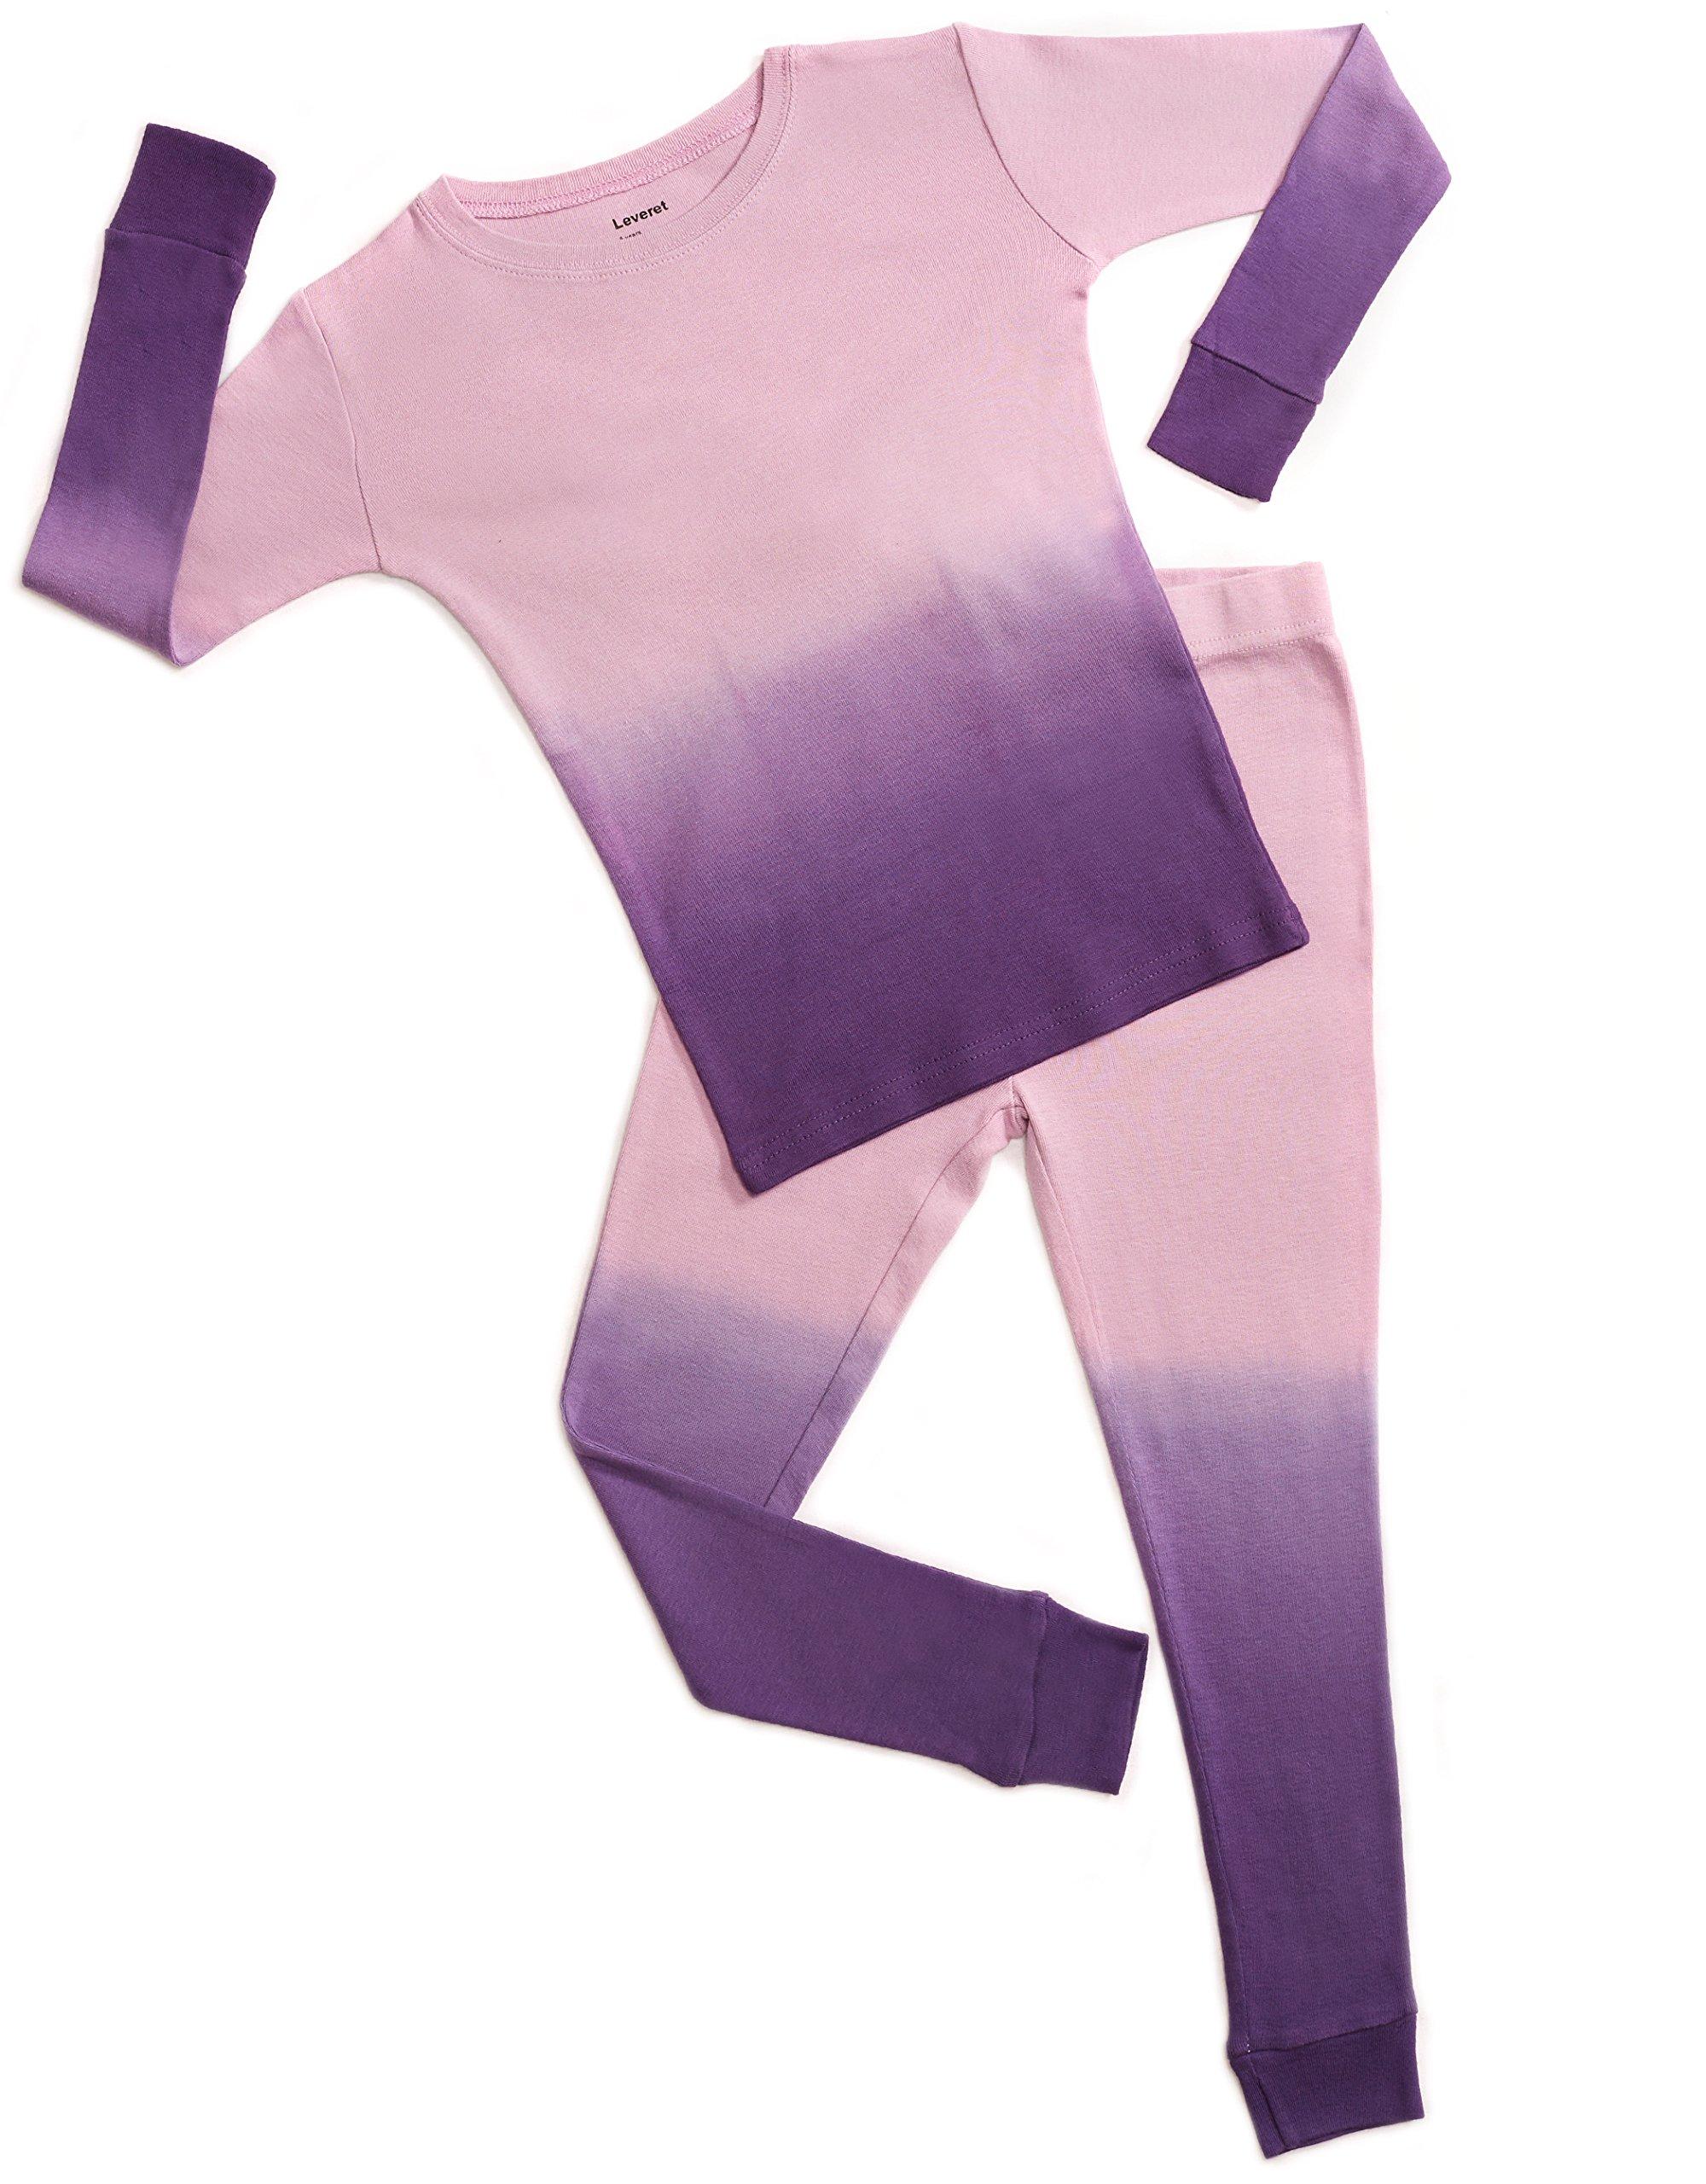 Leveret Organic Cotton Tie-Dye Purple 2 Piece Pajama Set 5 Years